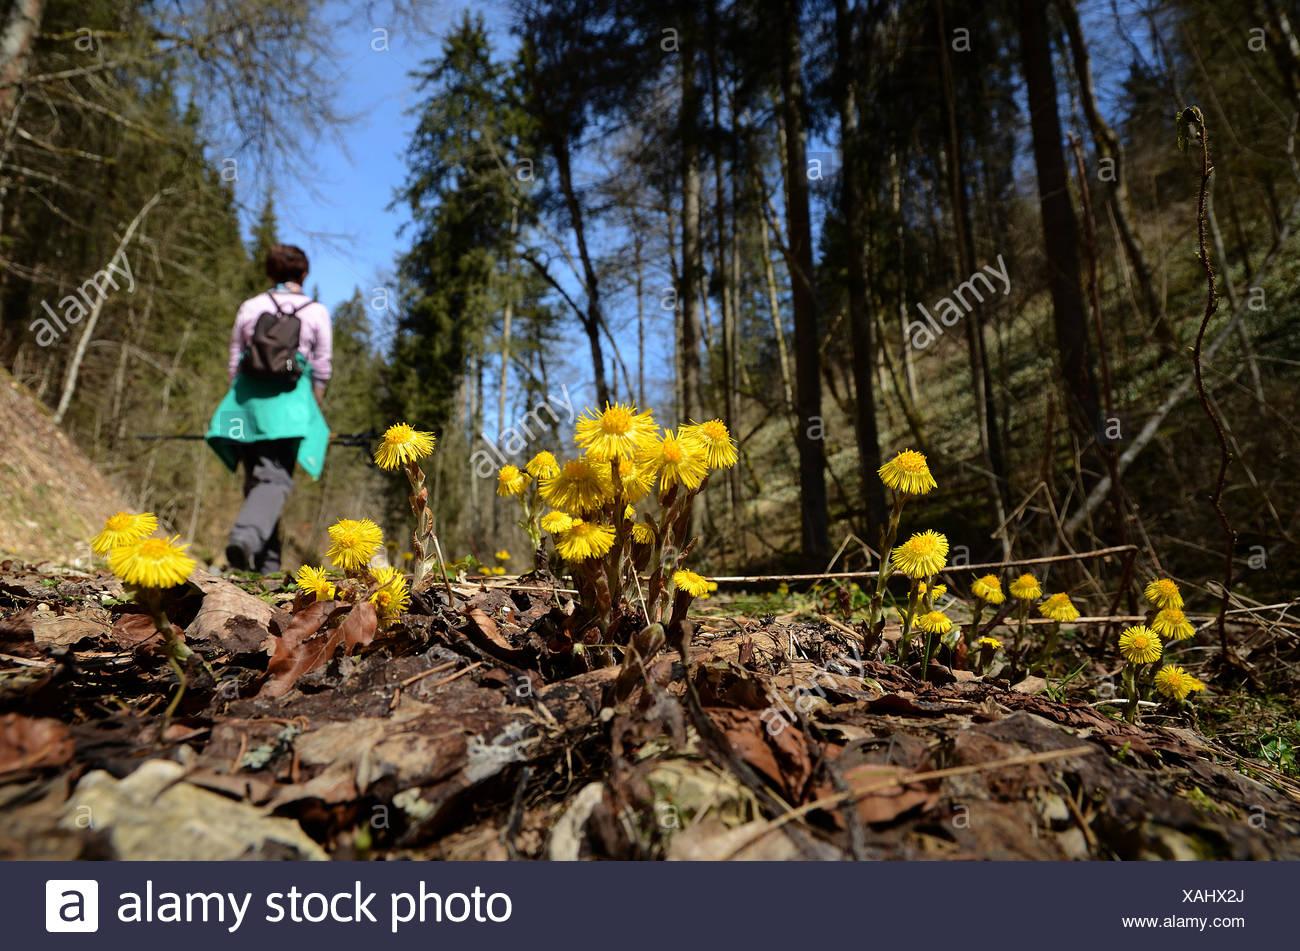 coltsfoot; walk; spring walk; wander; hike; - Stock Image